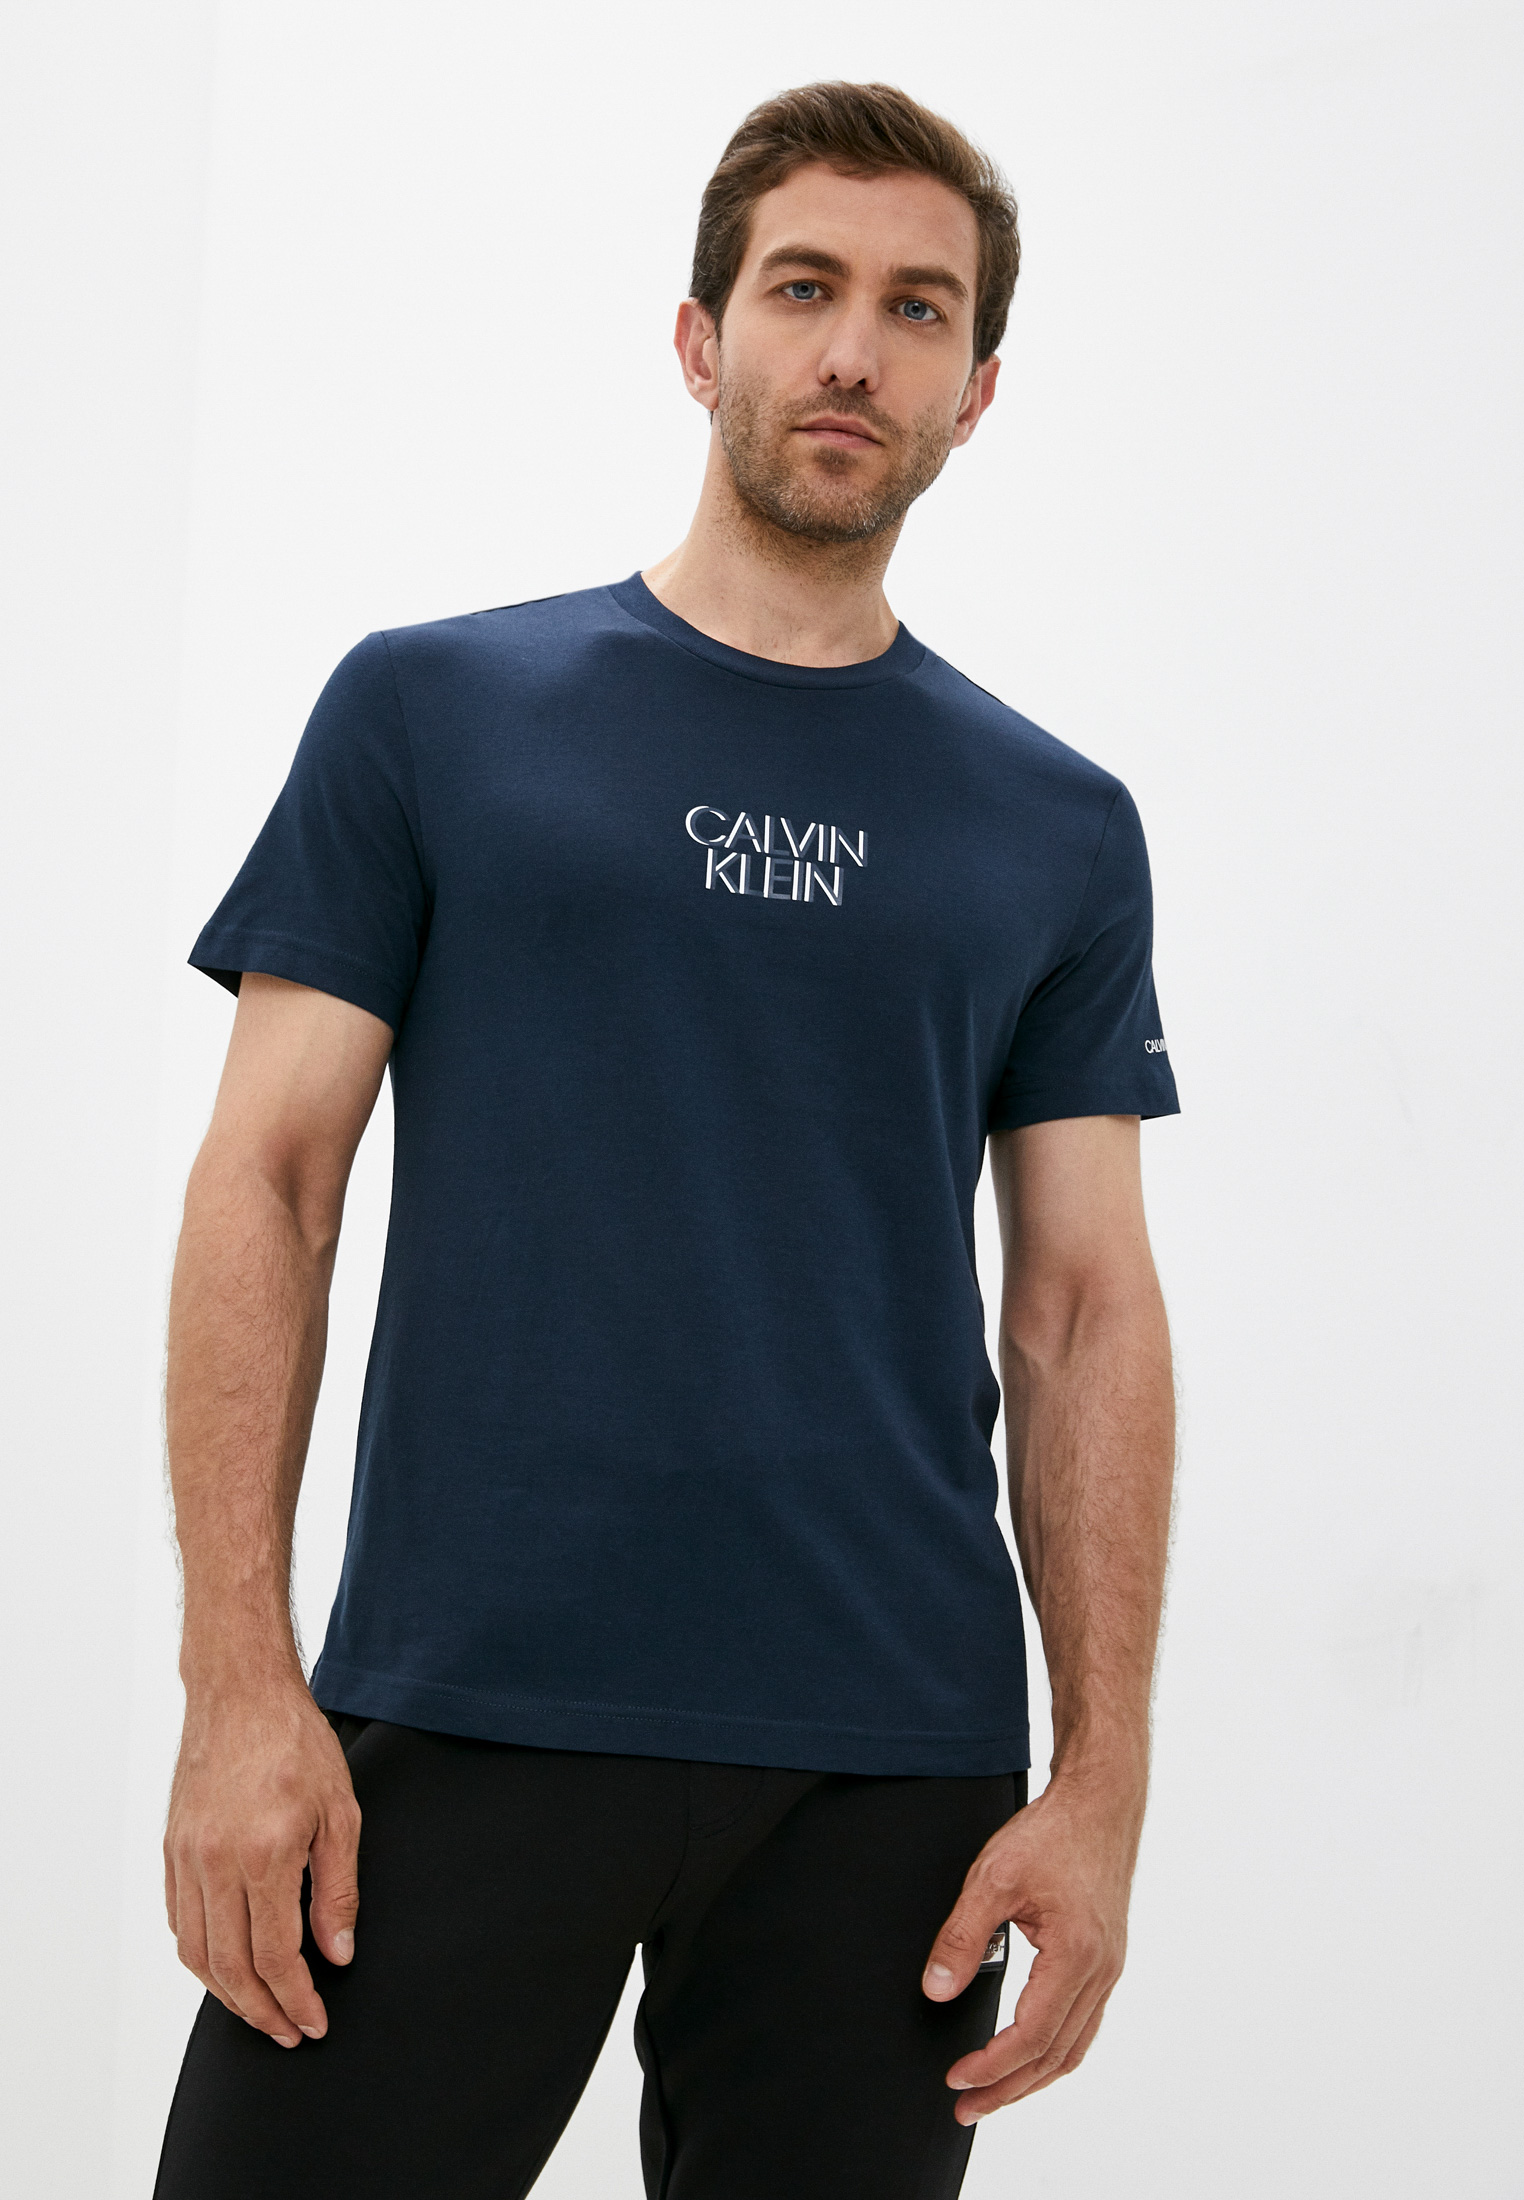 Мужская футболка Calvin Klein (Кельвин Кляйн) K10K106844